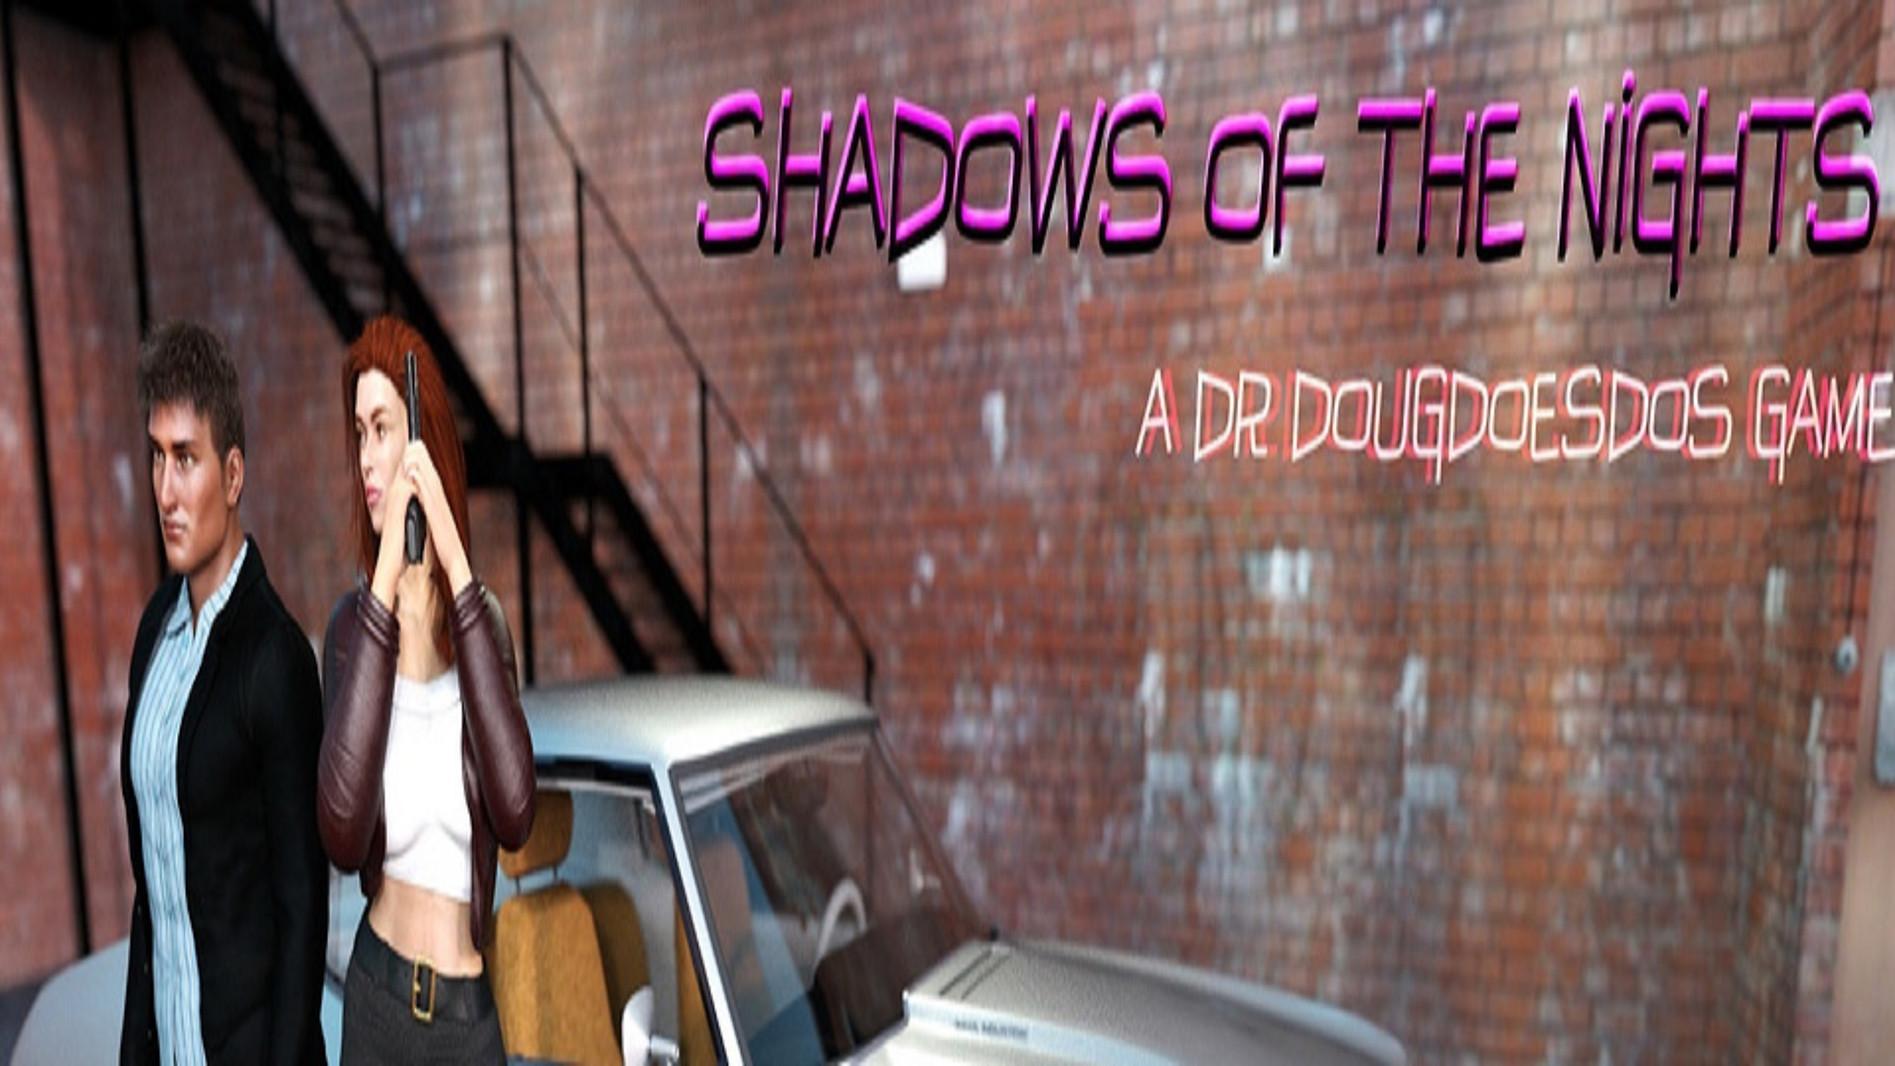 Shadows of the Nights Main - Haru's Hare